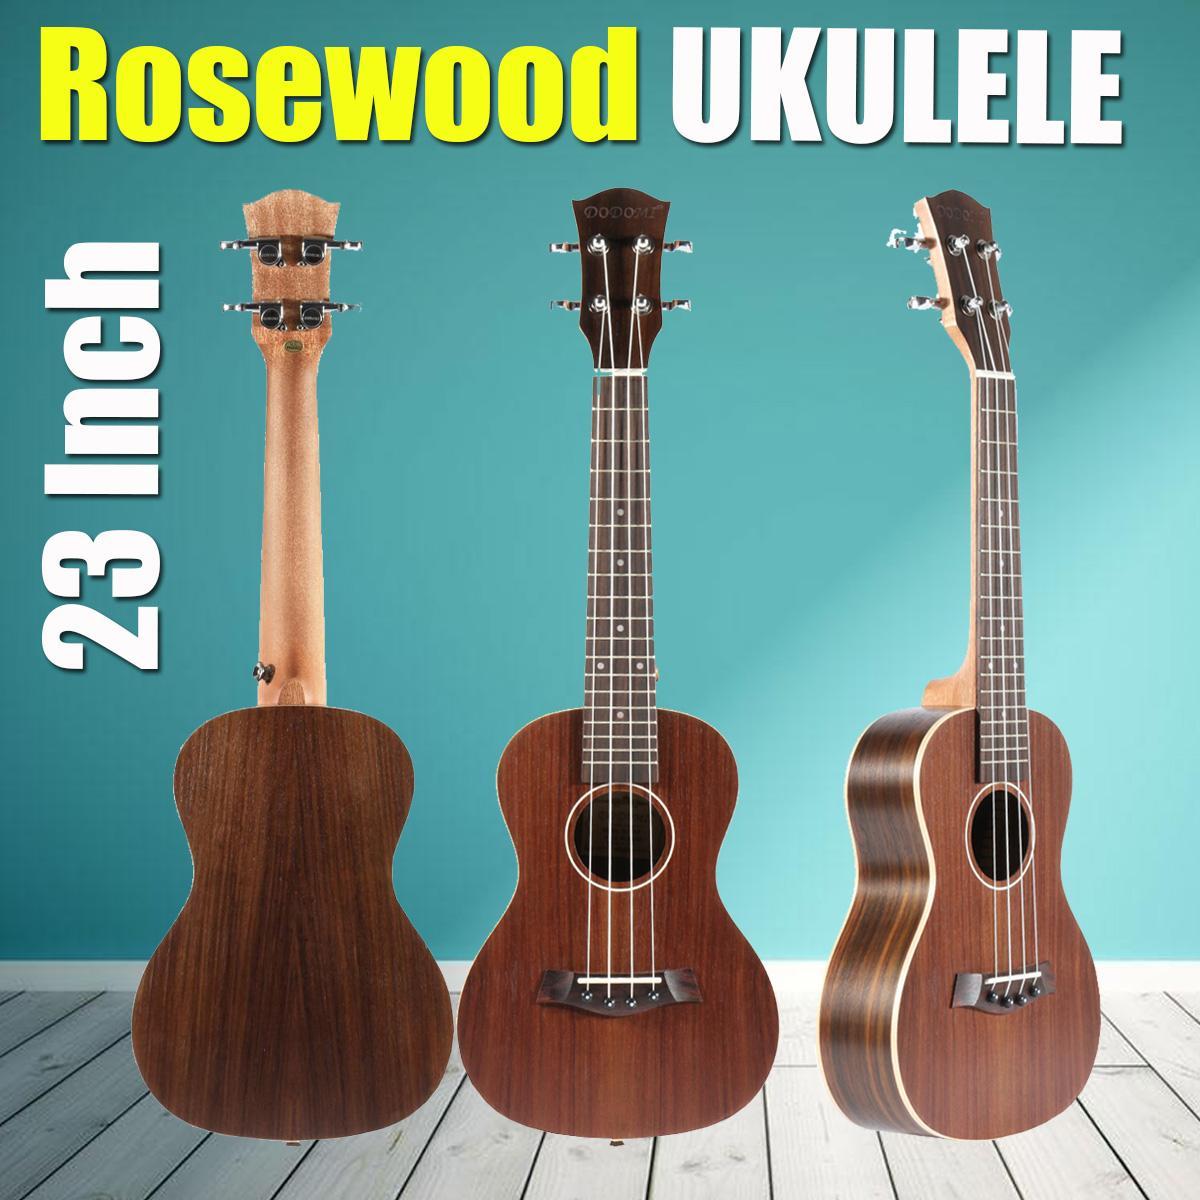 Zebra 23 Inch Rosewood 4 Strings Fretboard Concert Ukulele Electric Guitar Guitarra For Musical Stringed Instruments Lovers